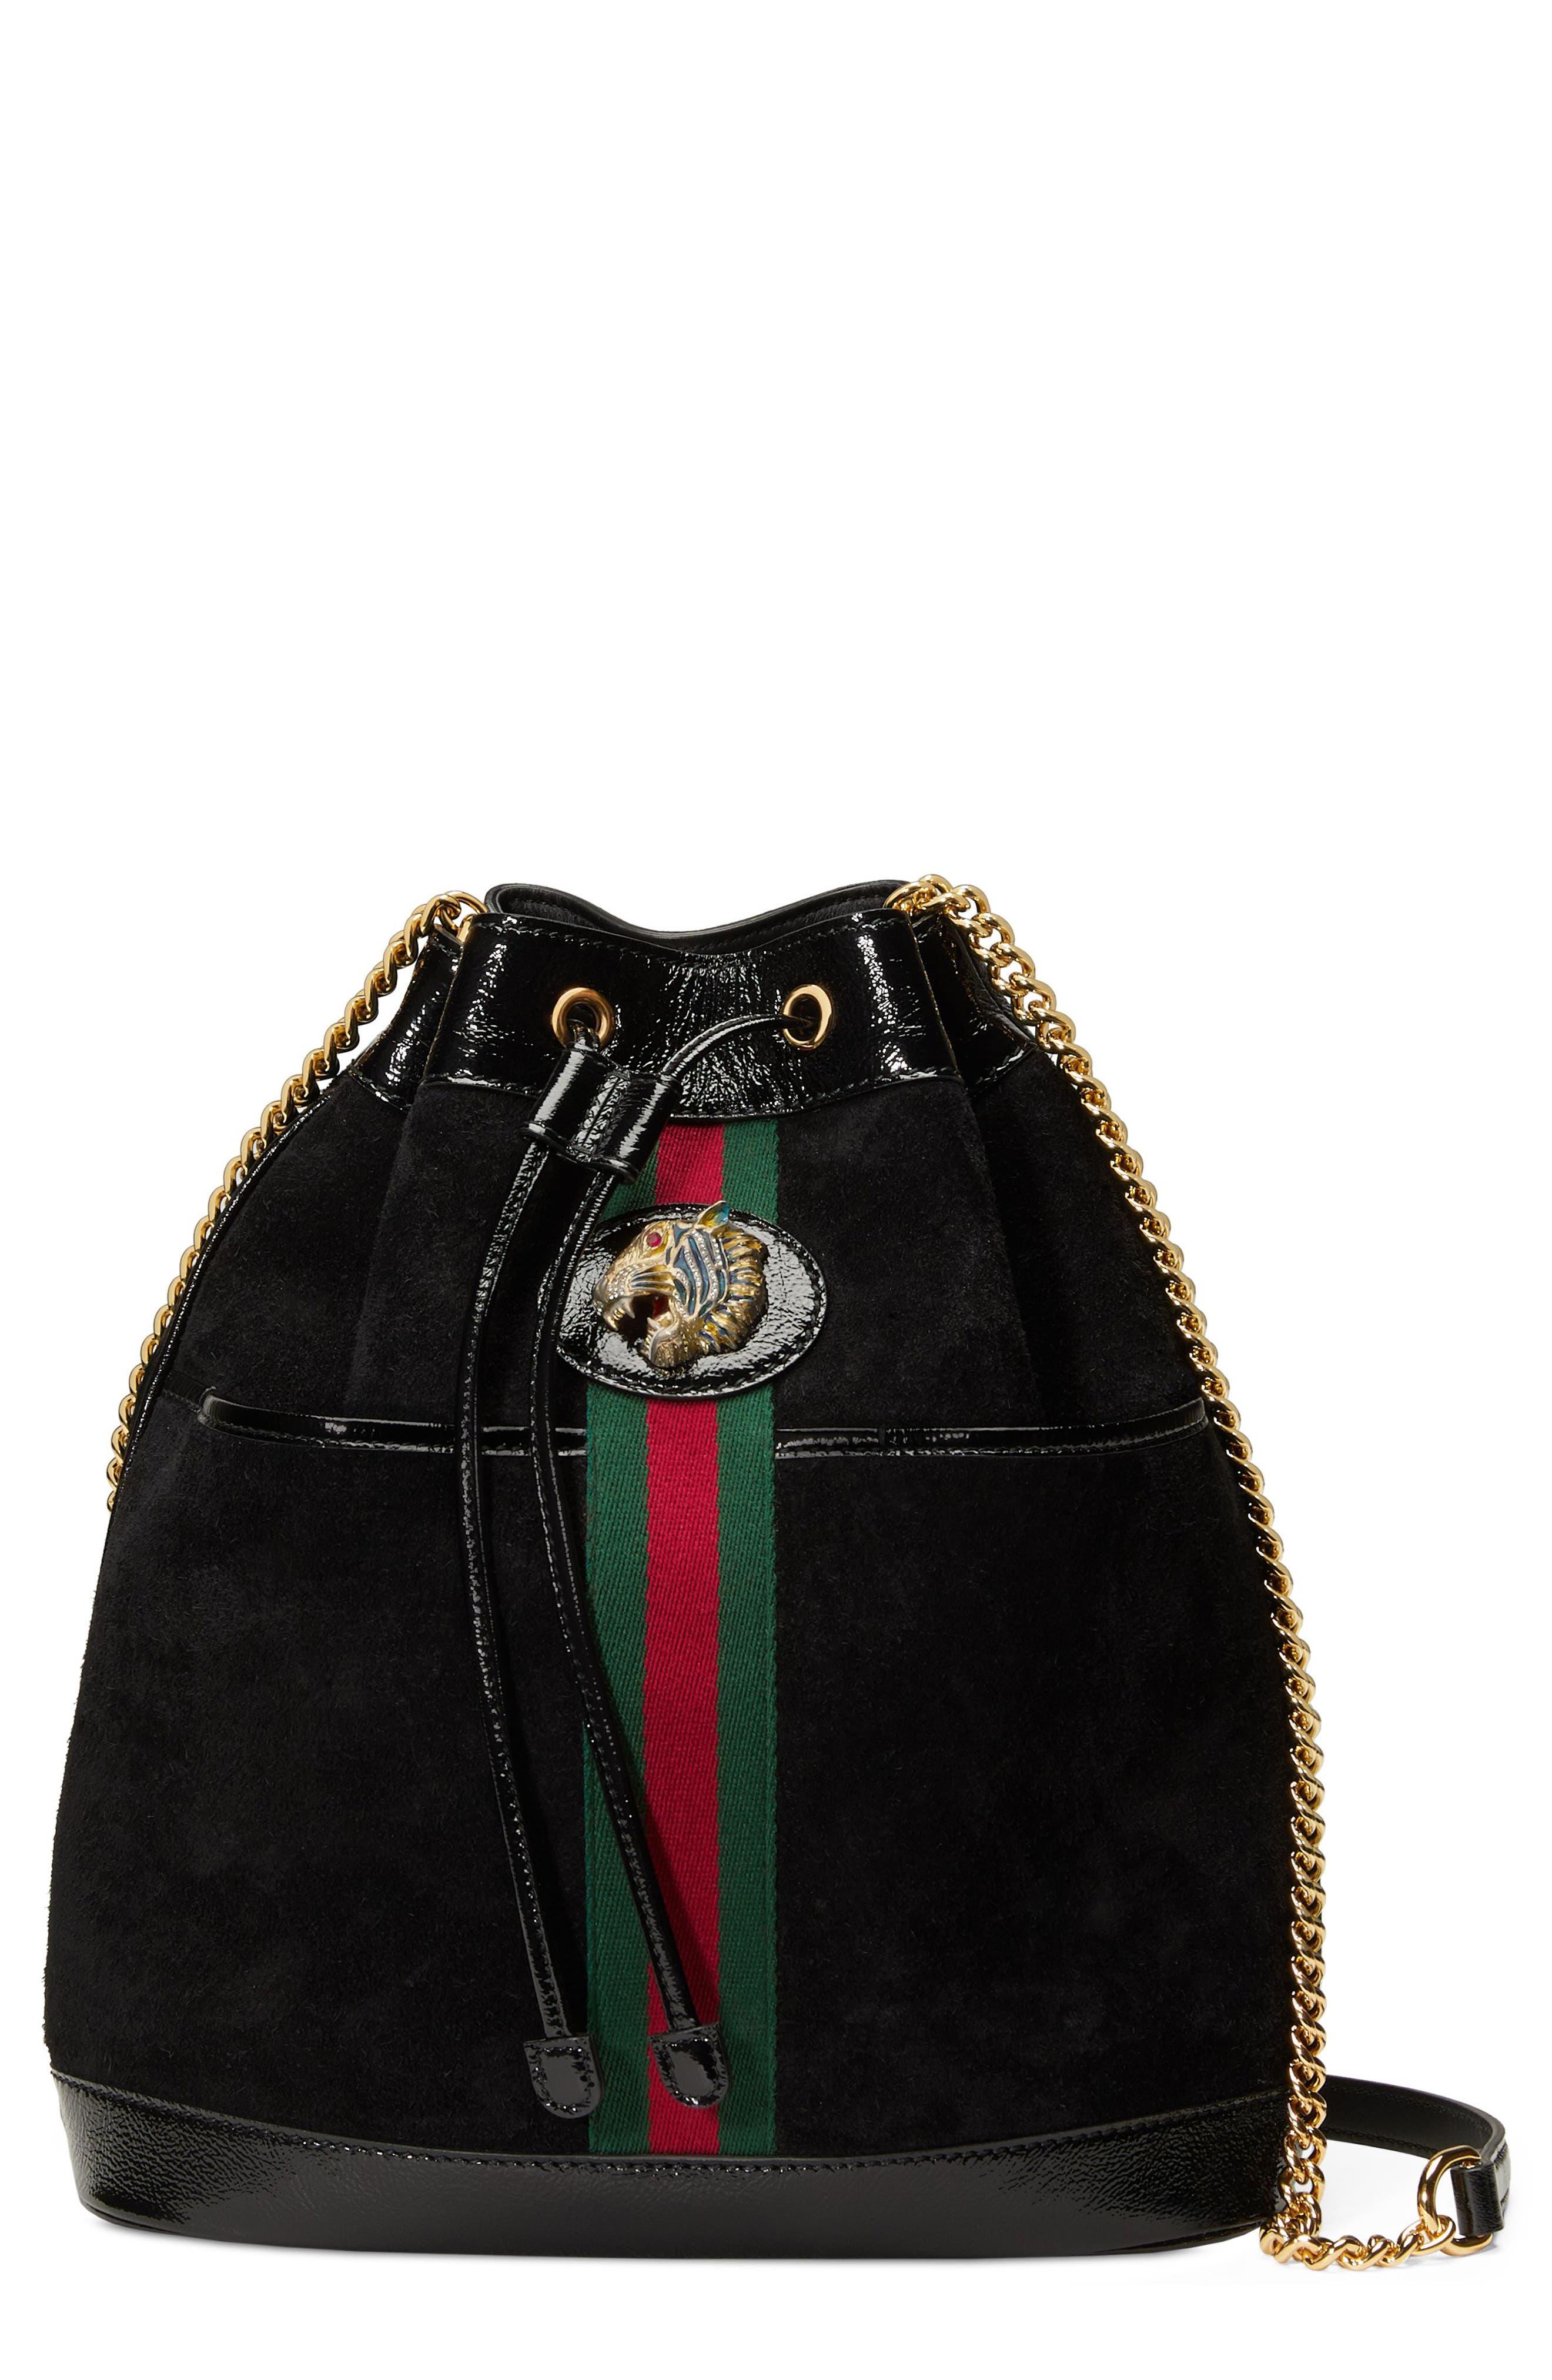 4907b57cf Gucci Brown Suede Bucket Bag